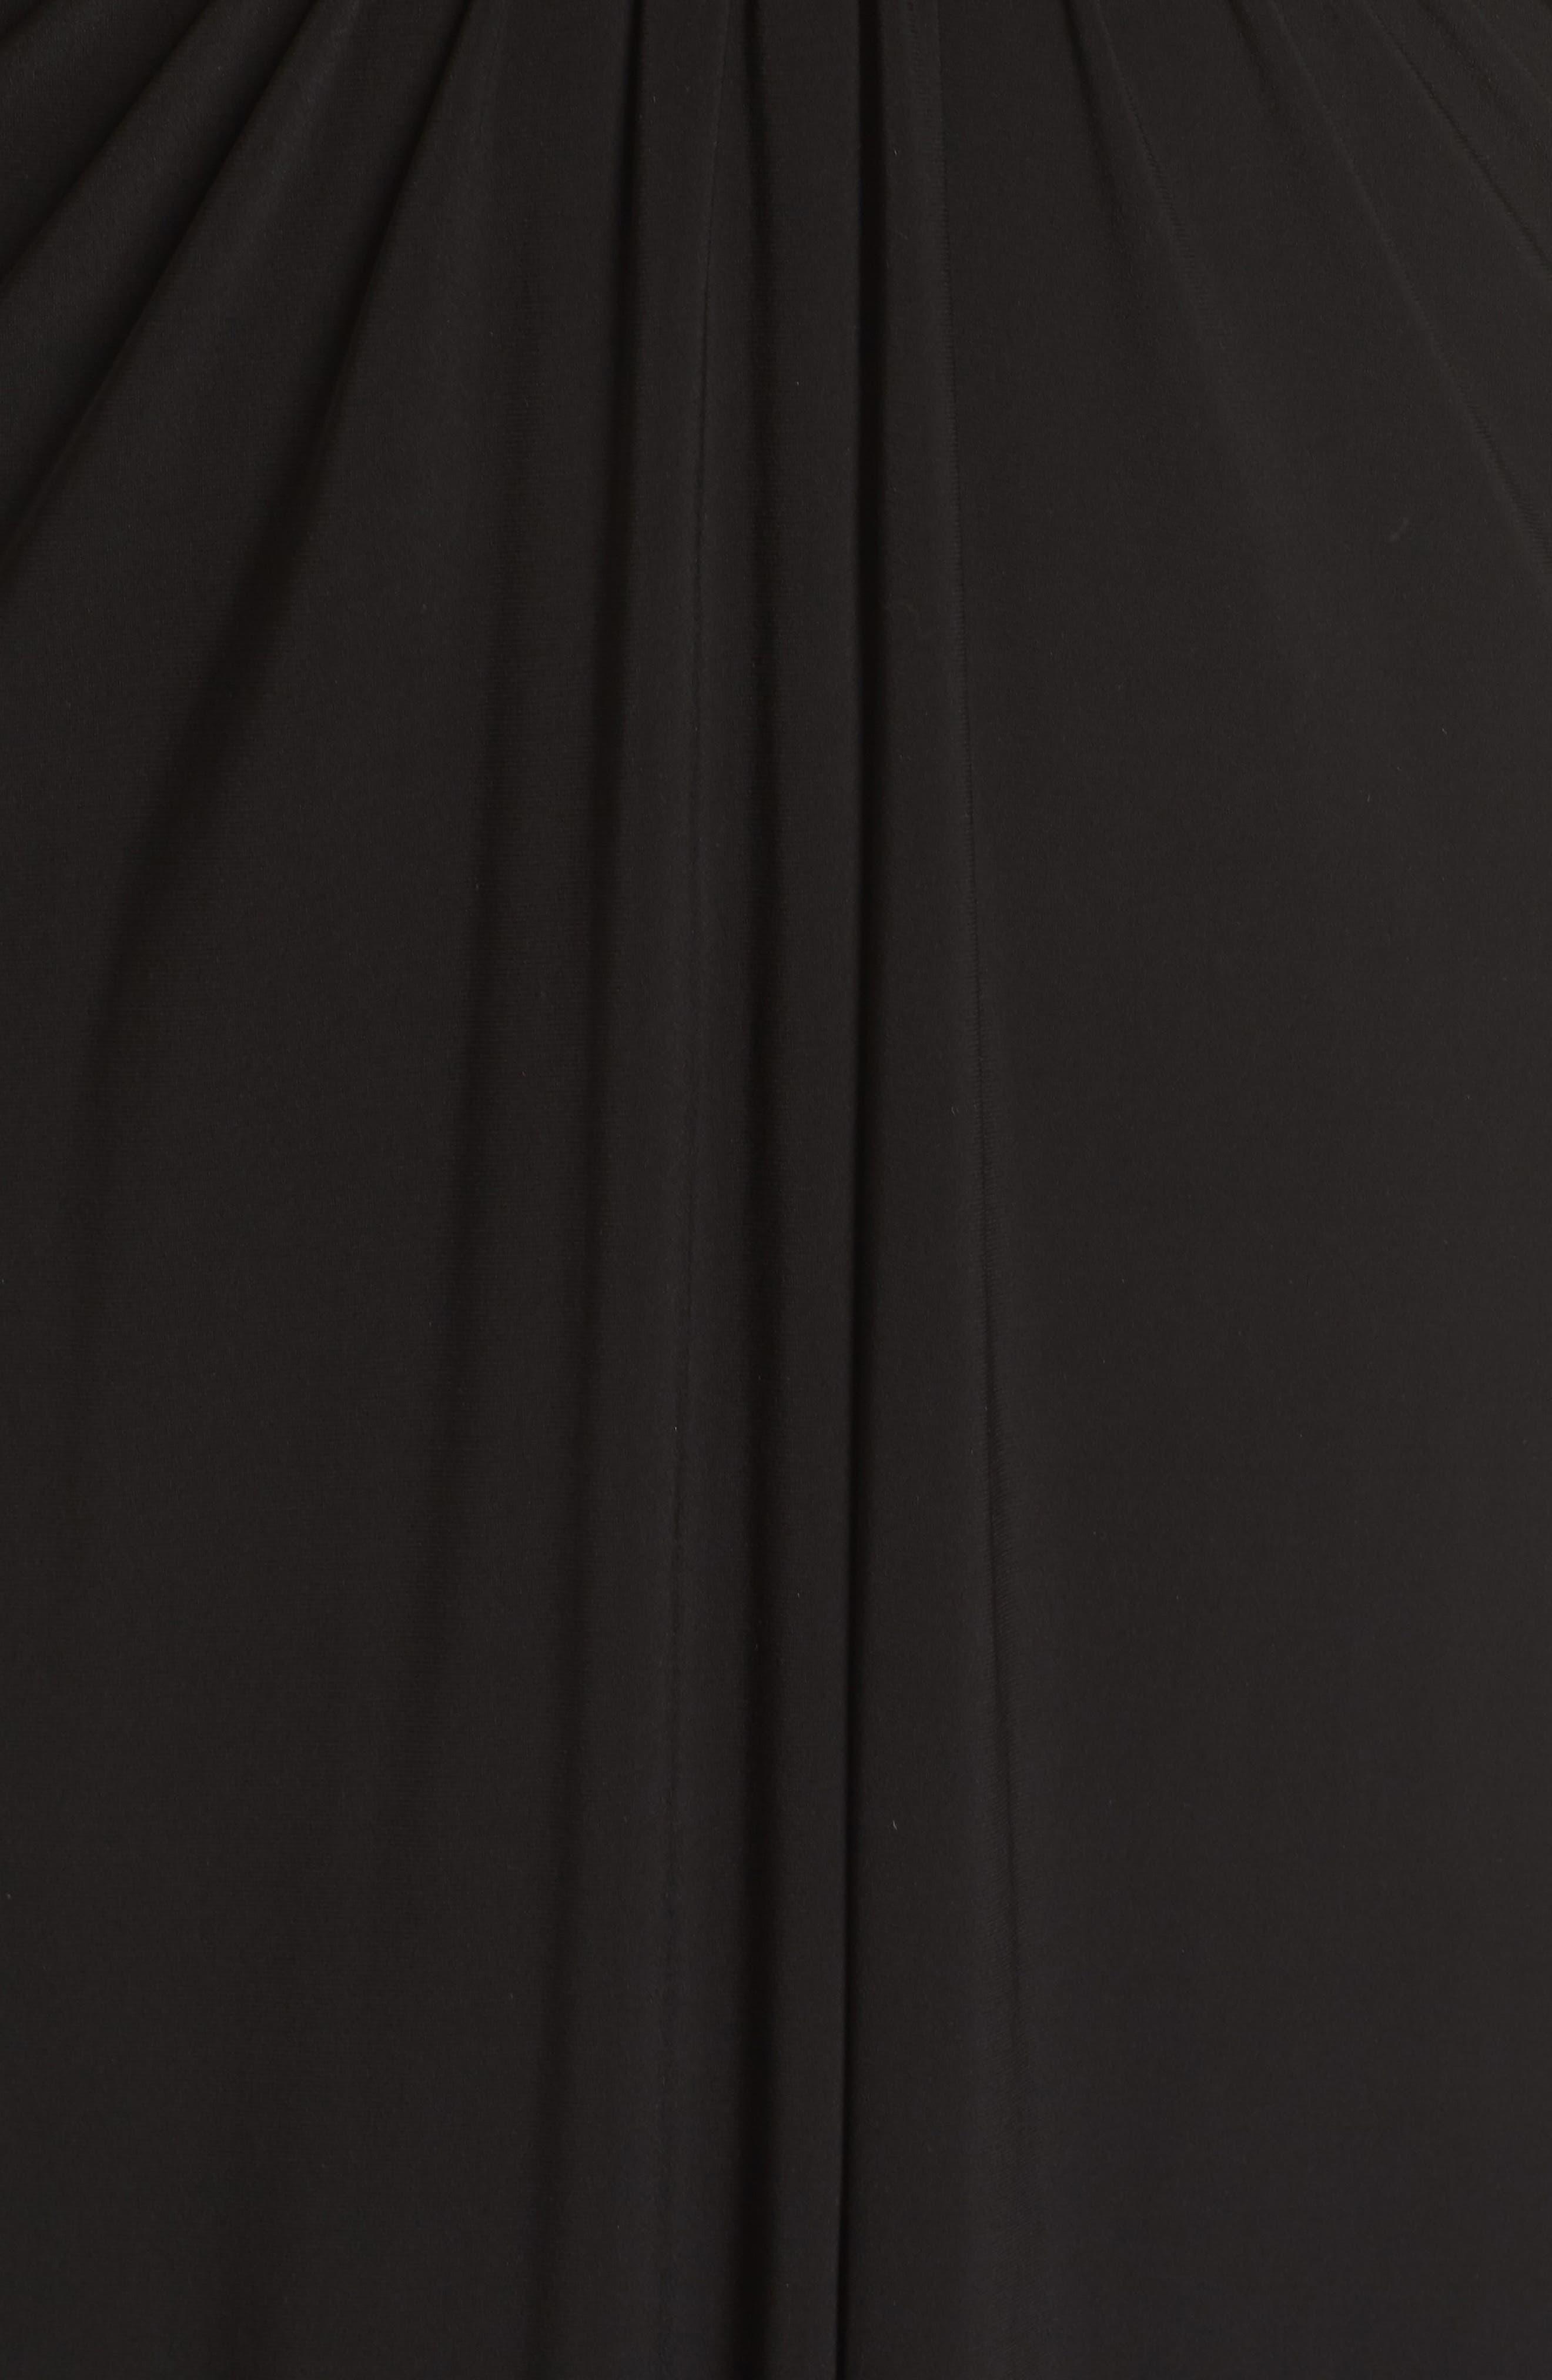 Embellished Gown,                             Alternate thumbnail 5, color,                             BLACK/ GOLD